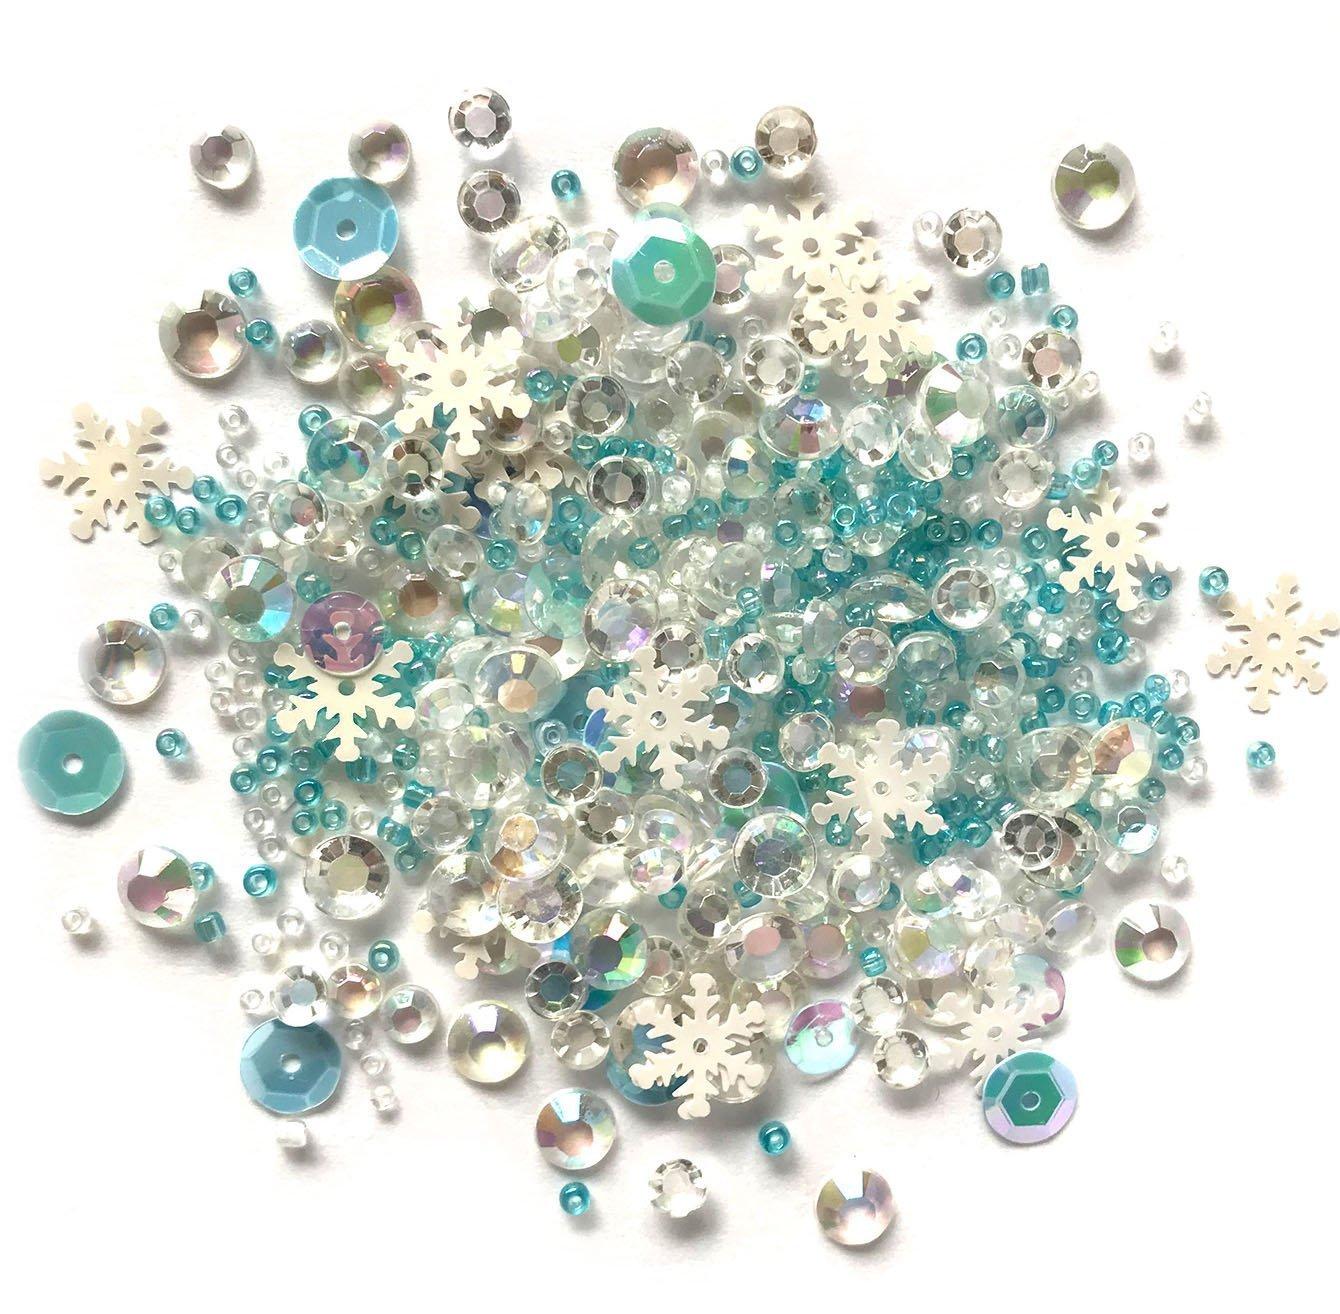 Buttons Galore - Sparkletz: Snow Crystals